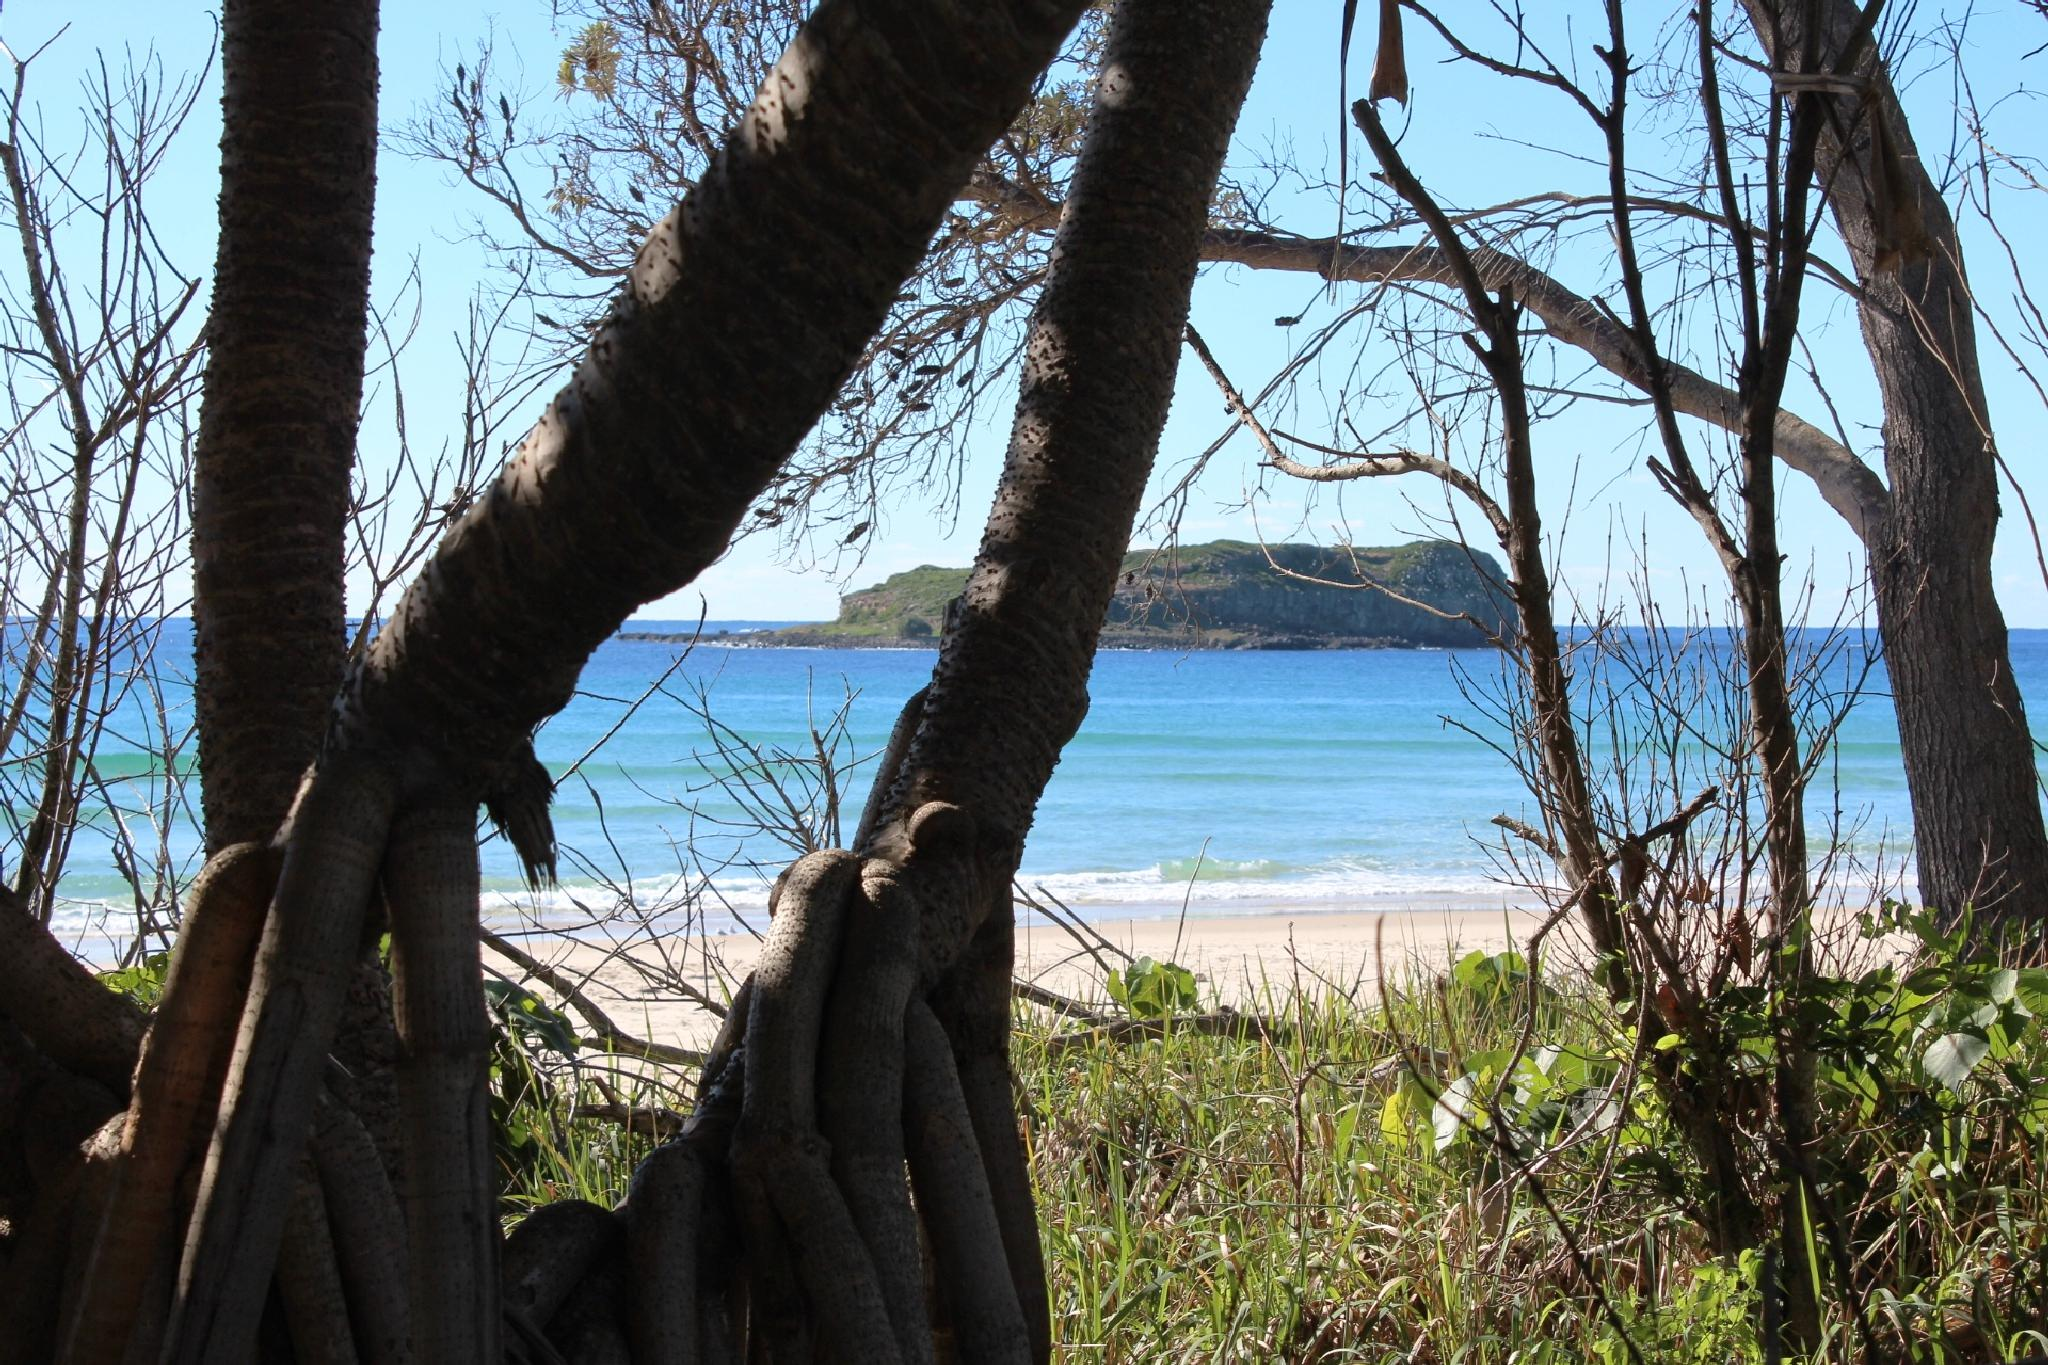 Island Paradise by RickyJ